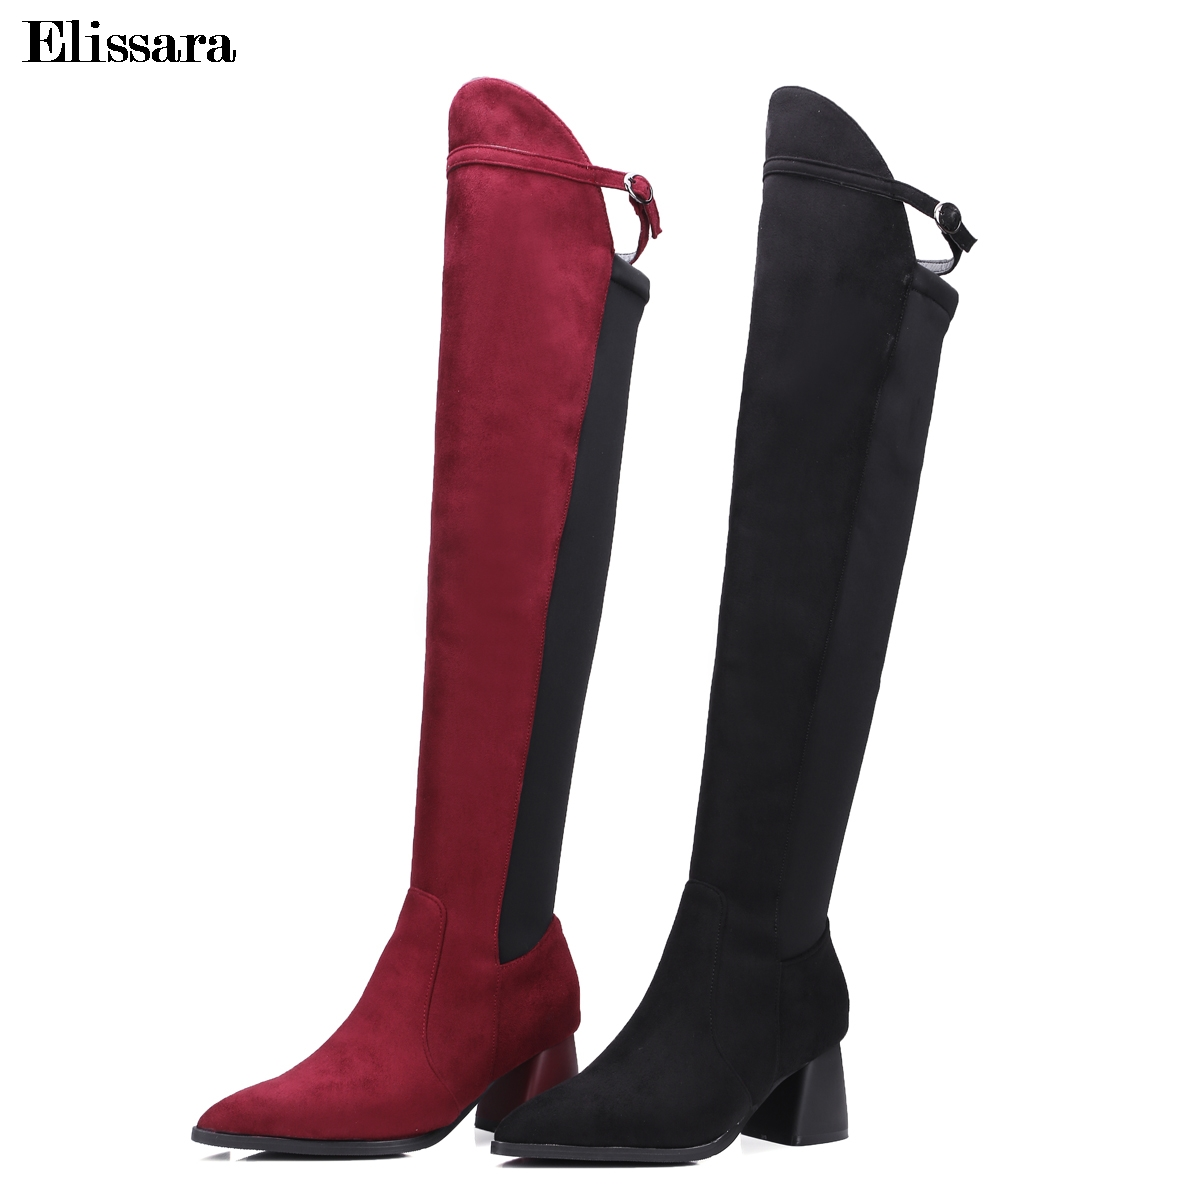 Elissara Women Winter Boots Women High Heels Over the Knee Boots Women Fashion Thigh High Boots Shoes Plus Size 33-43